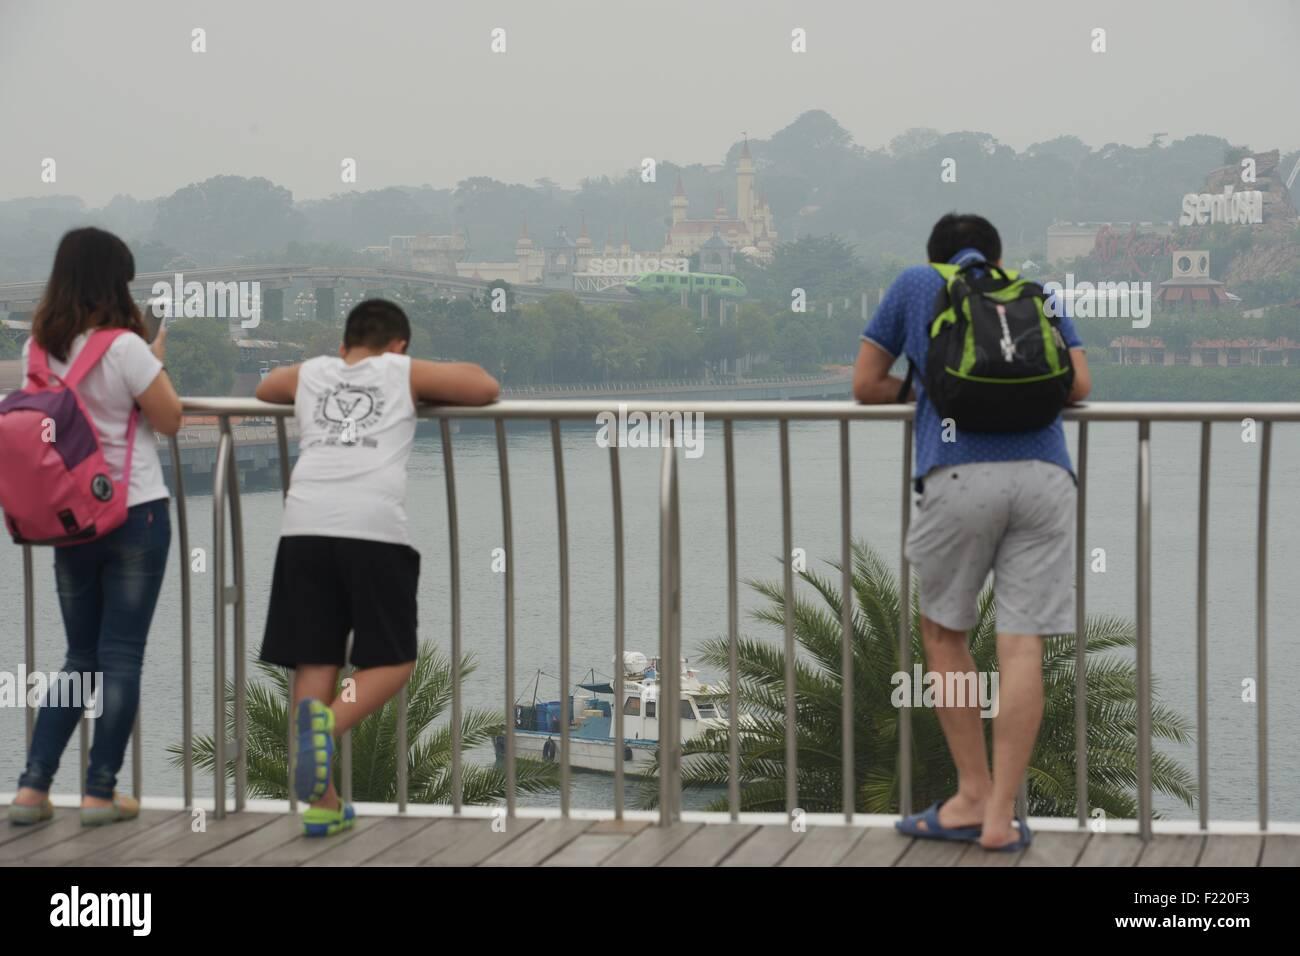 Singapore. 10th Sep, 2015. Haze looms over Singapore's Sentosa Island, on Sept. 10, 2015. Singapore's pollution - Stock Image